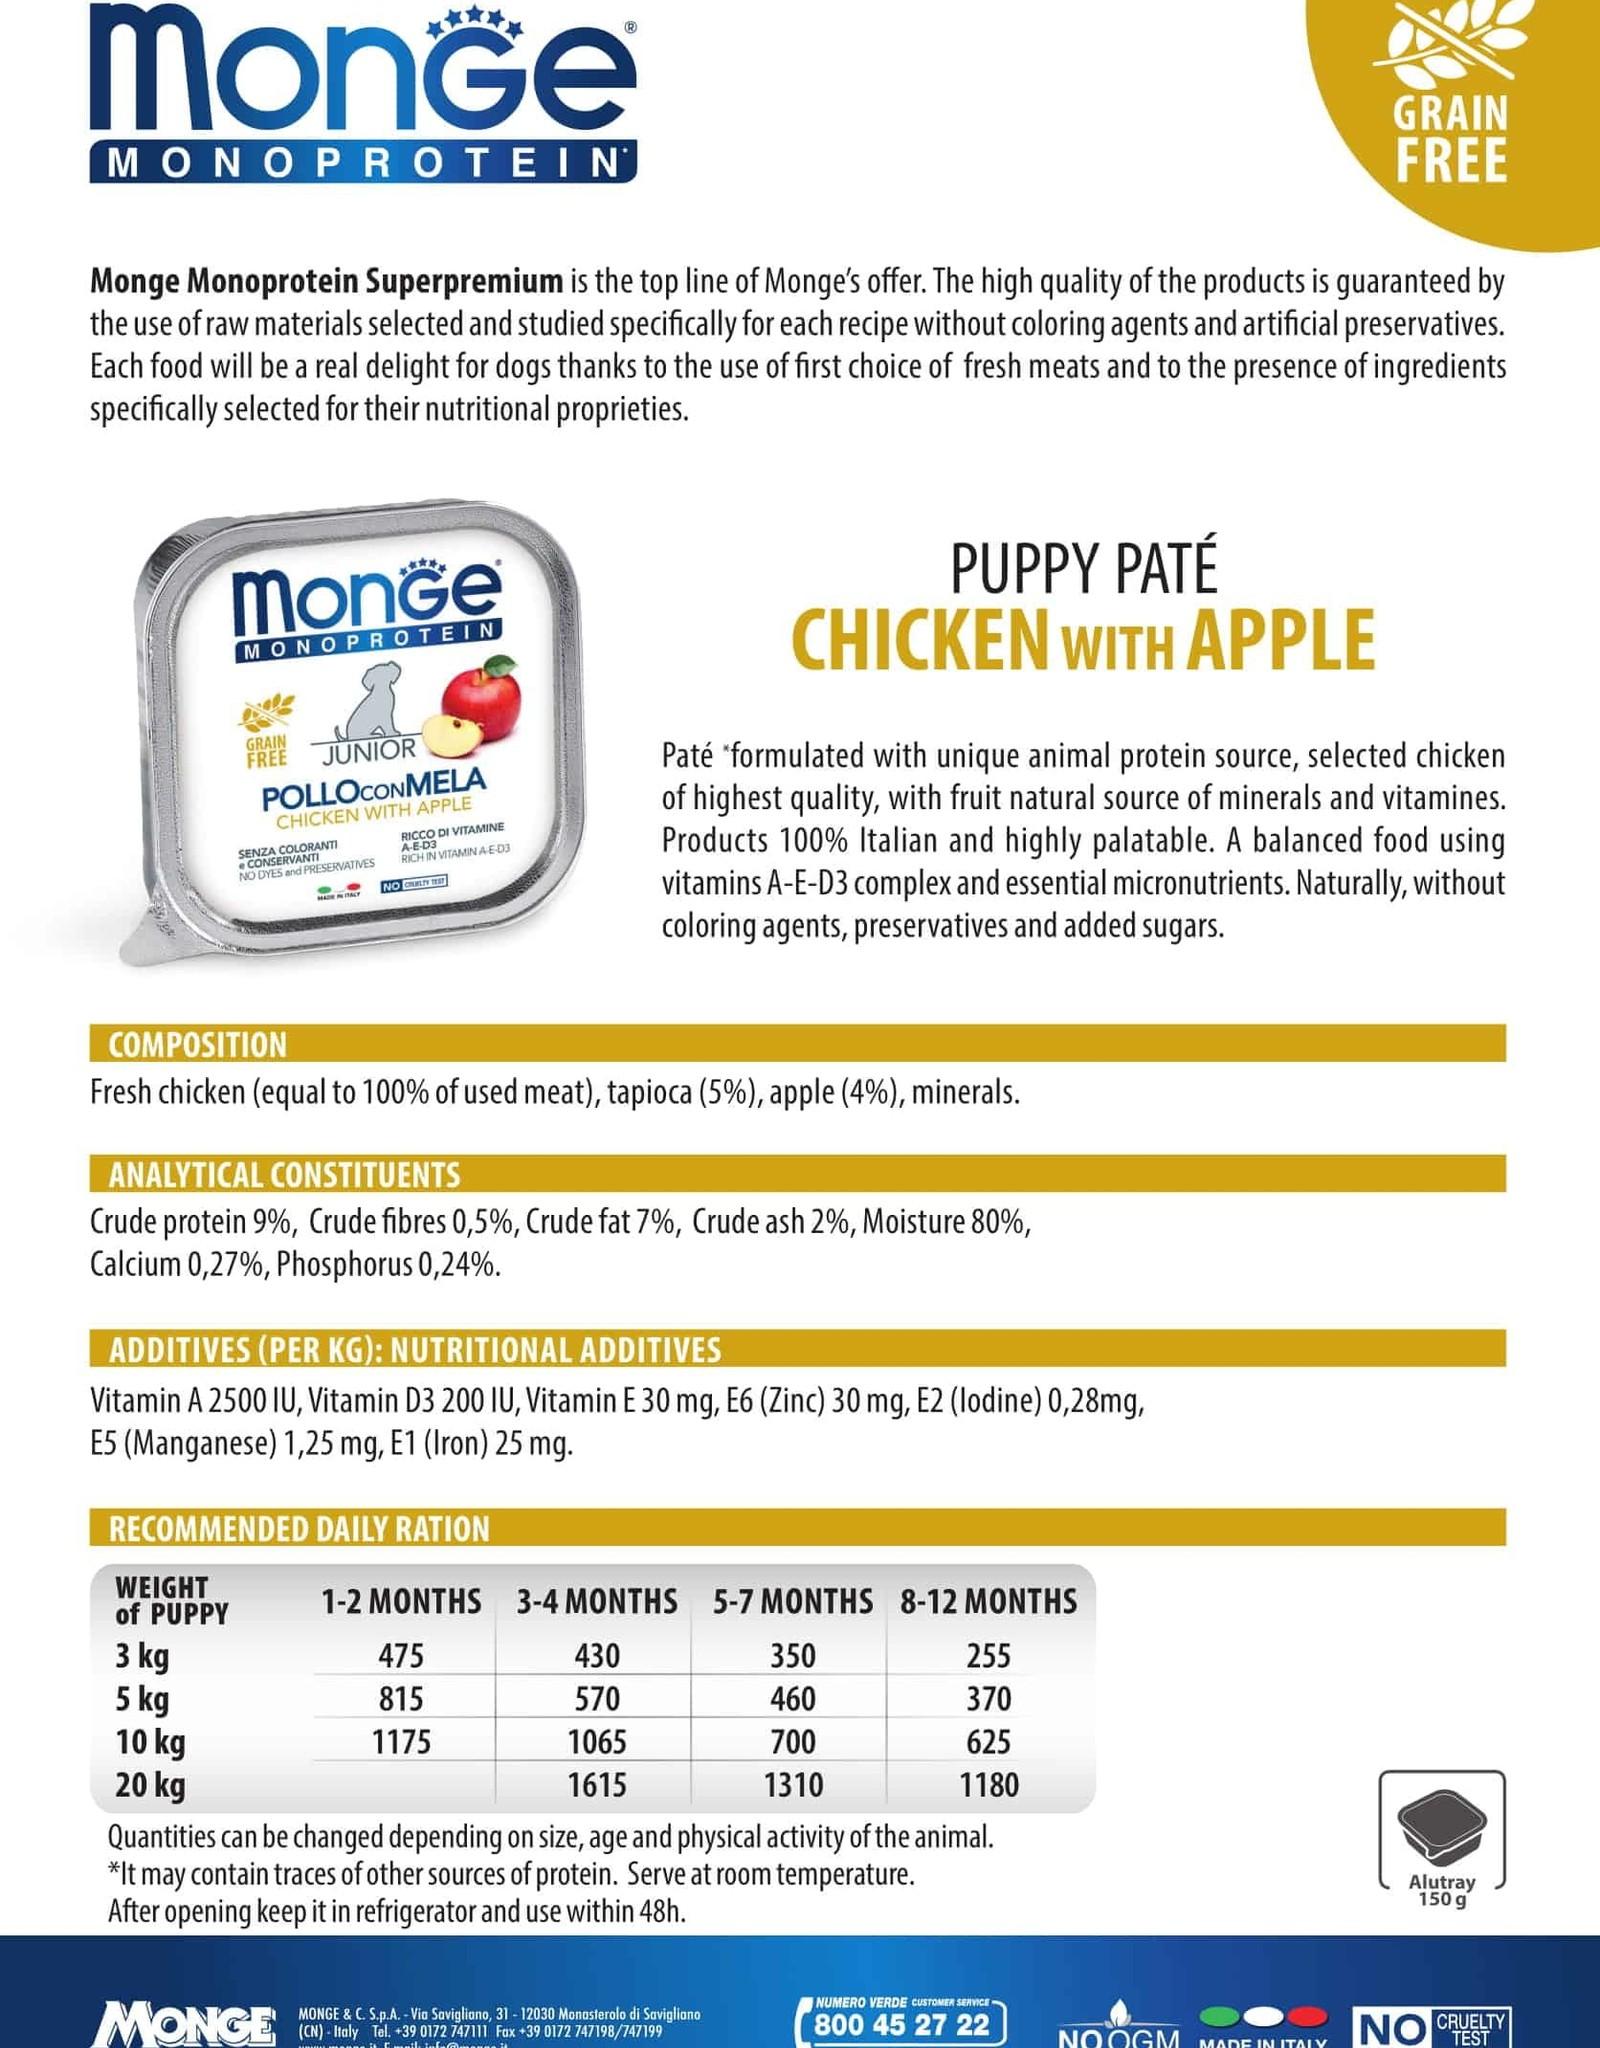 Monge Wet Puppy Chicken With Apple